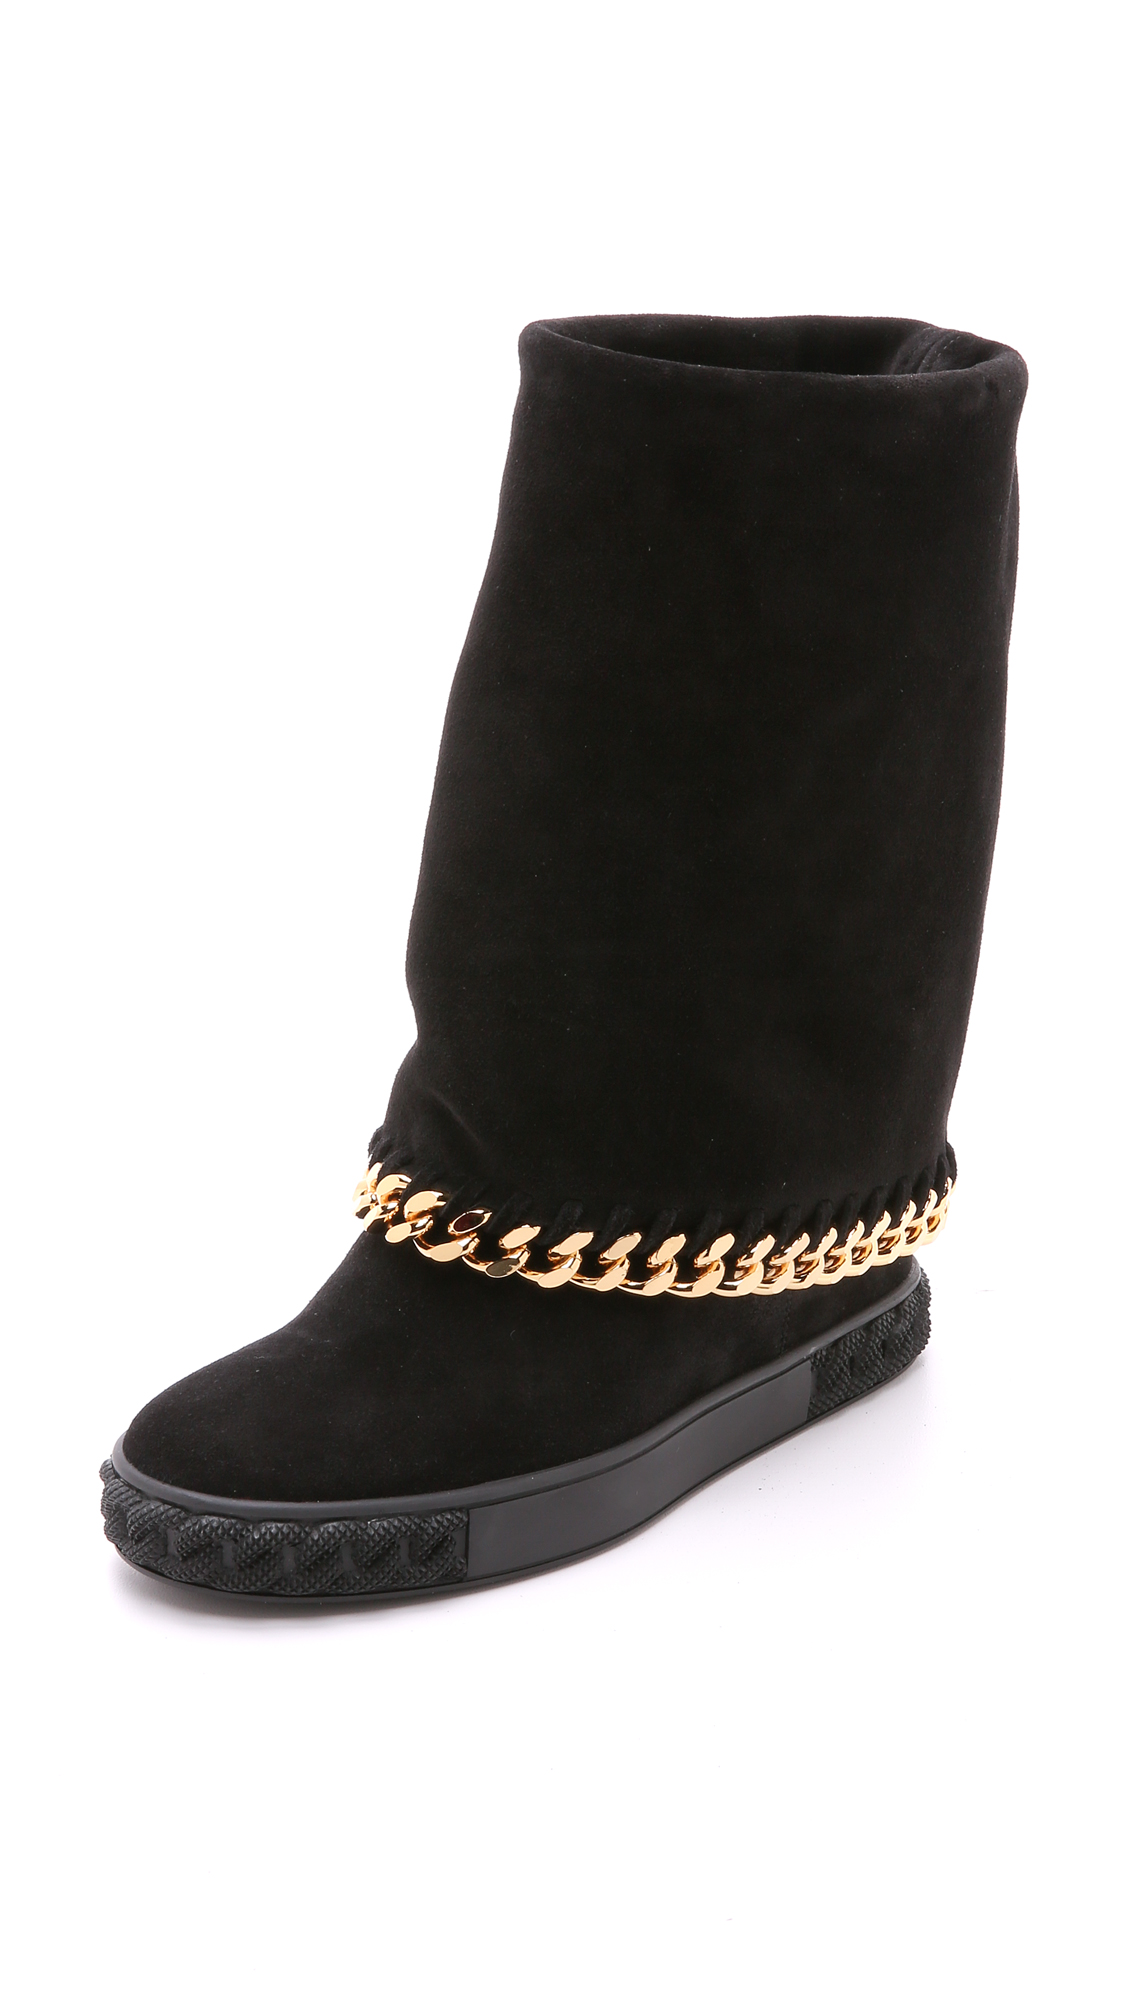 Casadei Hidden Wedge Fold Over Boots In Black